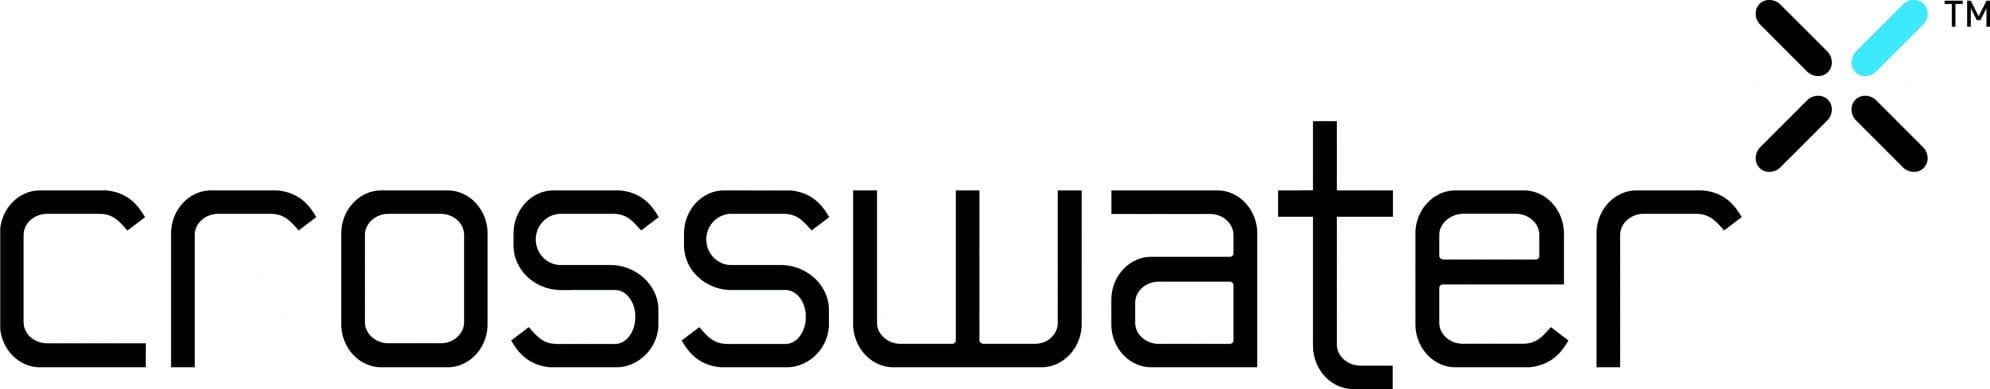 Image result for crosswater dartford logo